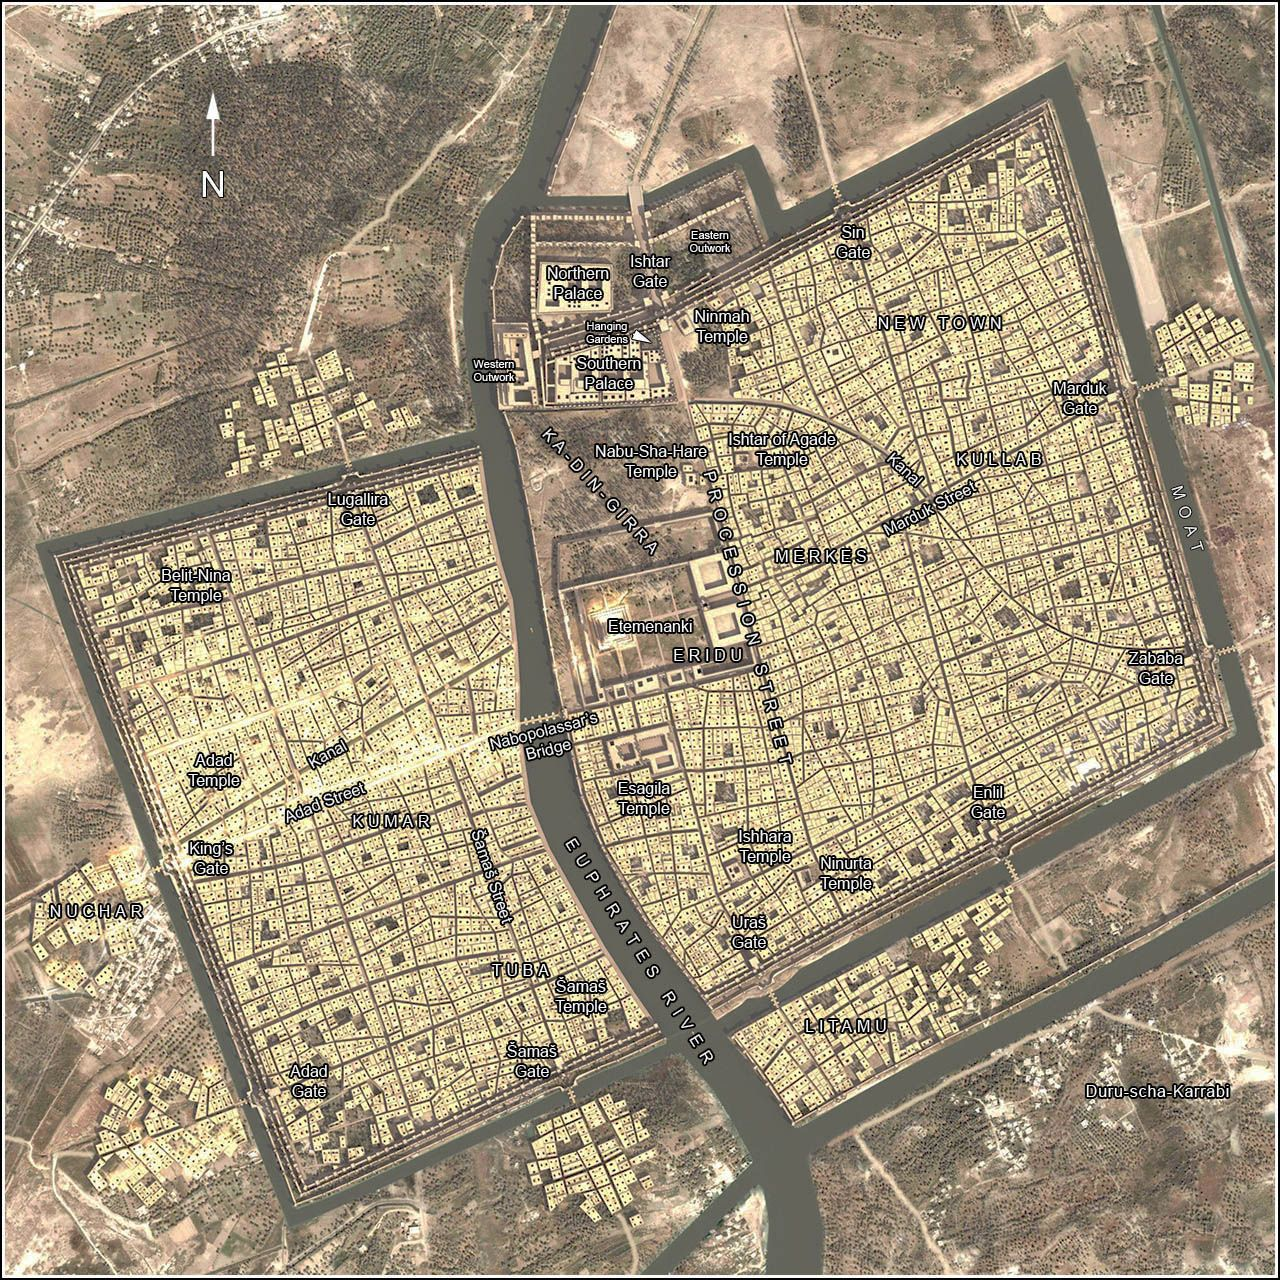 The ancient city of Babylon. | Ancient babylon, Ancient ... on aerial map of manhattan, aerial map of ephesus, aerial map of jordan, aerial map of stonehenge, aerial map of angkor wat, aerial map of greece, aerial map of troy, aerial map of rome, aerial map of machu picchu, aerial map of petra, aerial map of iran, aerial map of syria, aerial map of jericho, aerial map of iraq, aerial map of jerusalem, aerial map of middle east, aerial map of atlantis, aerial map of atlantic city, aerial map of pompeii,